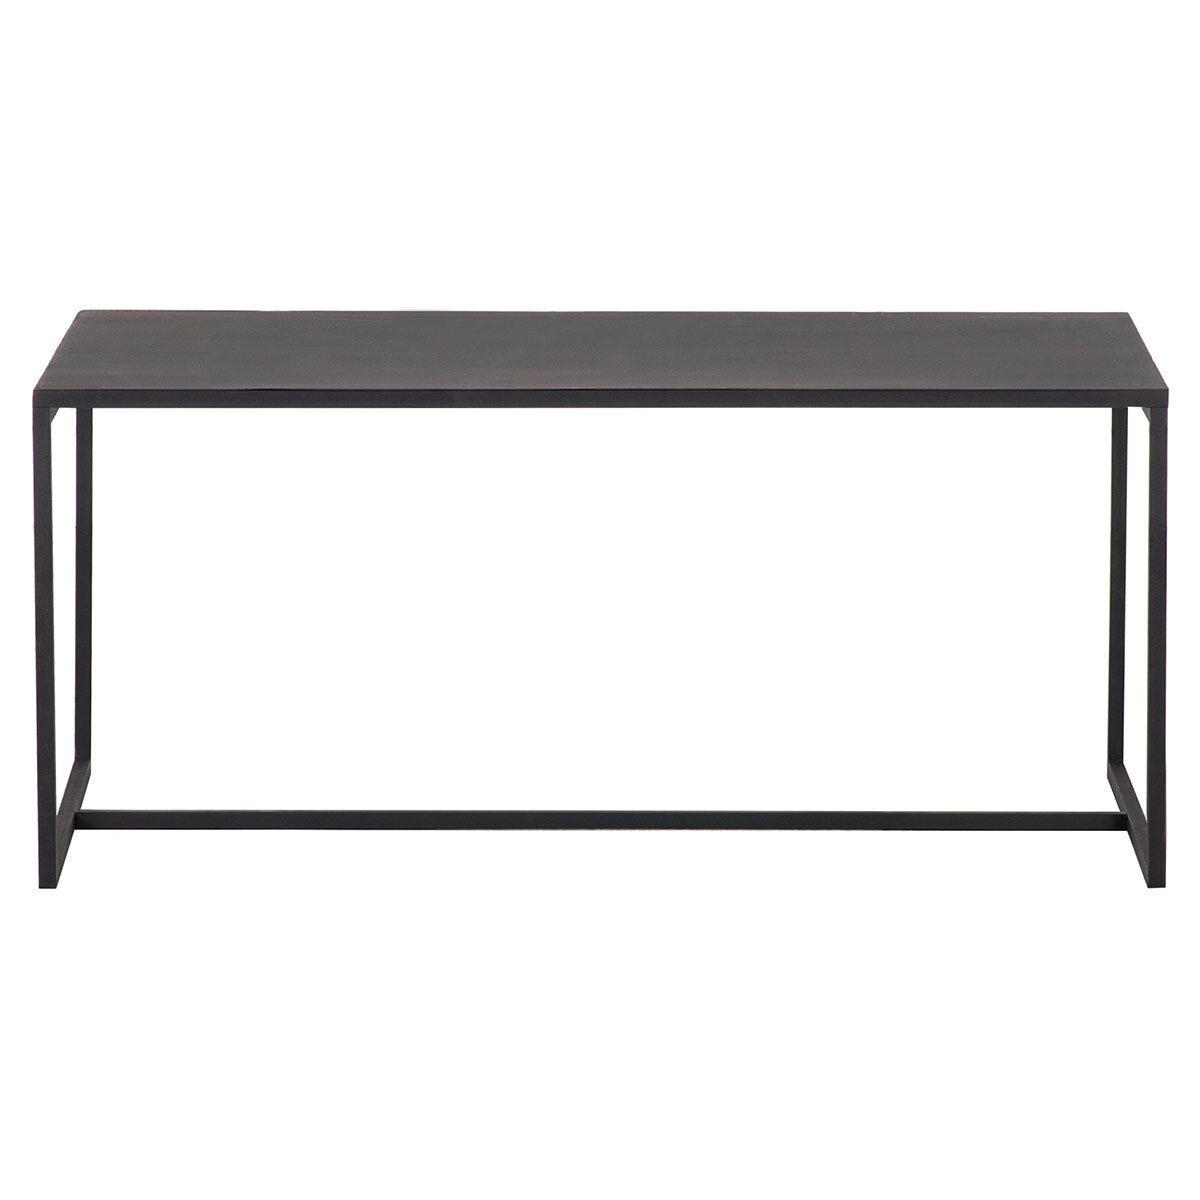 Miliboo Table basse industrielle métal noir KARL